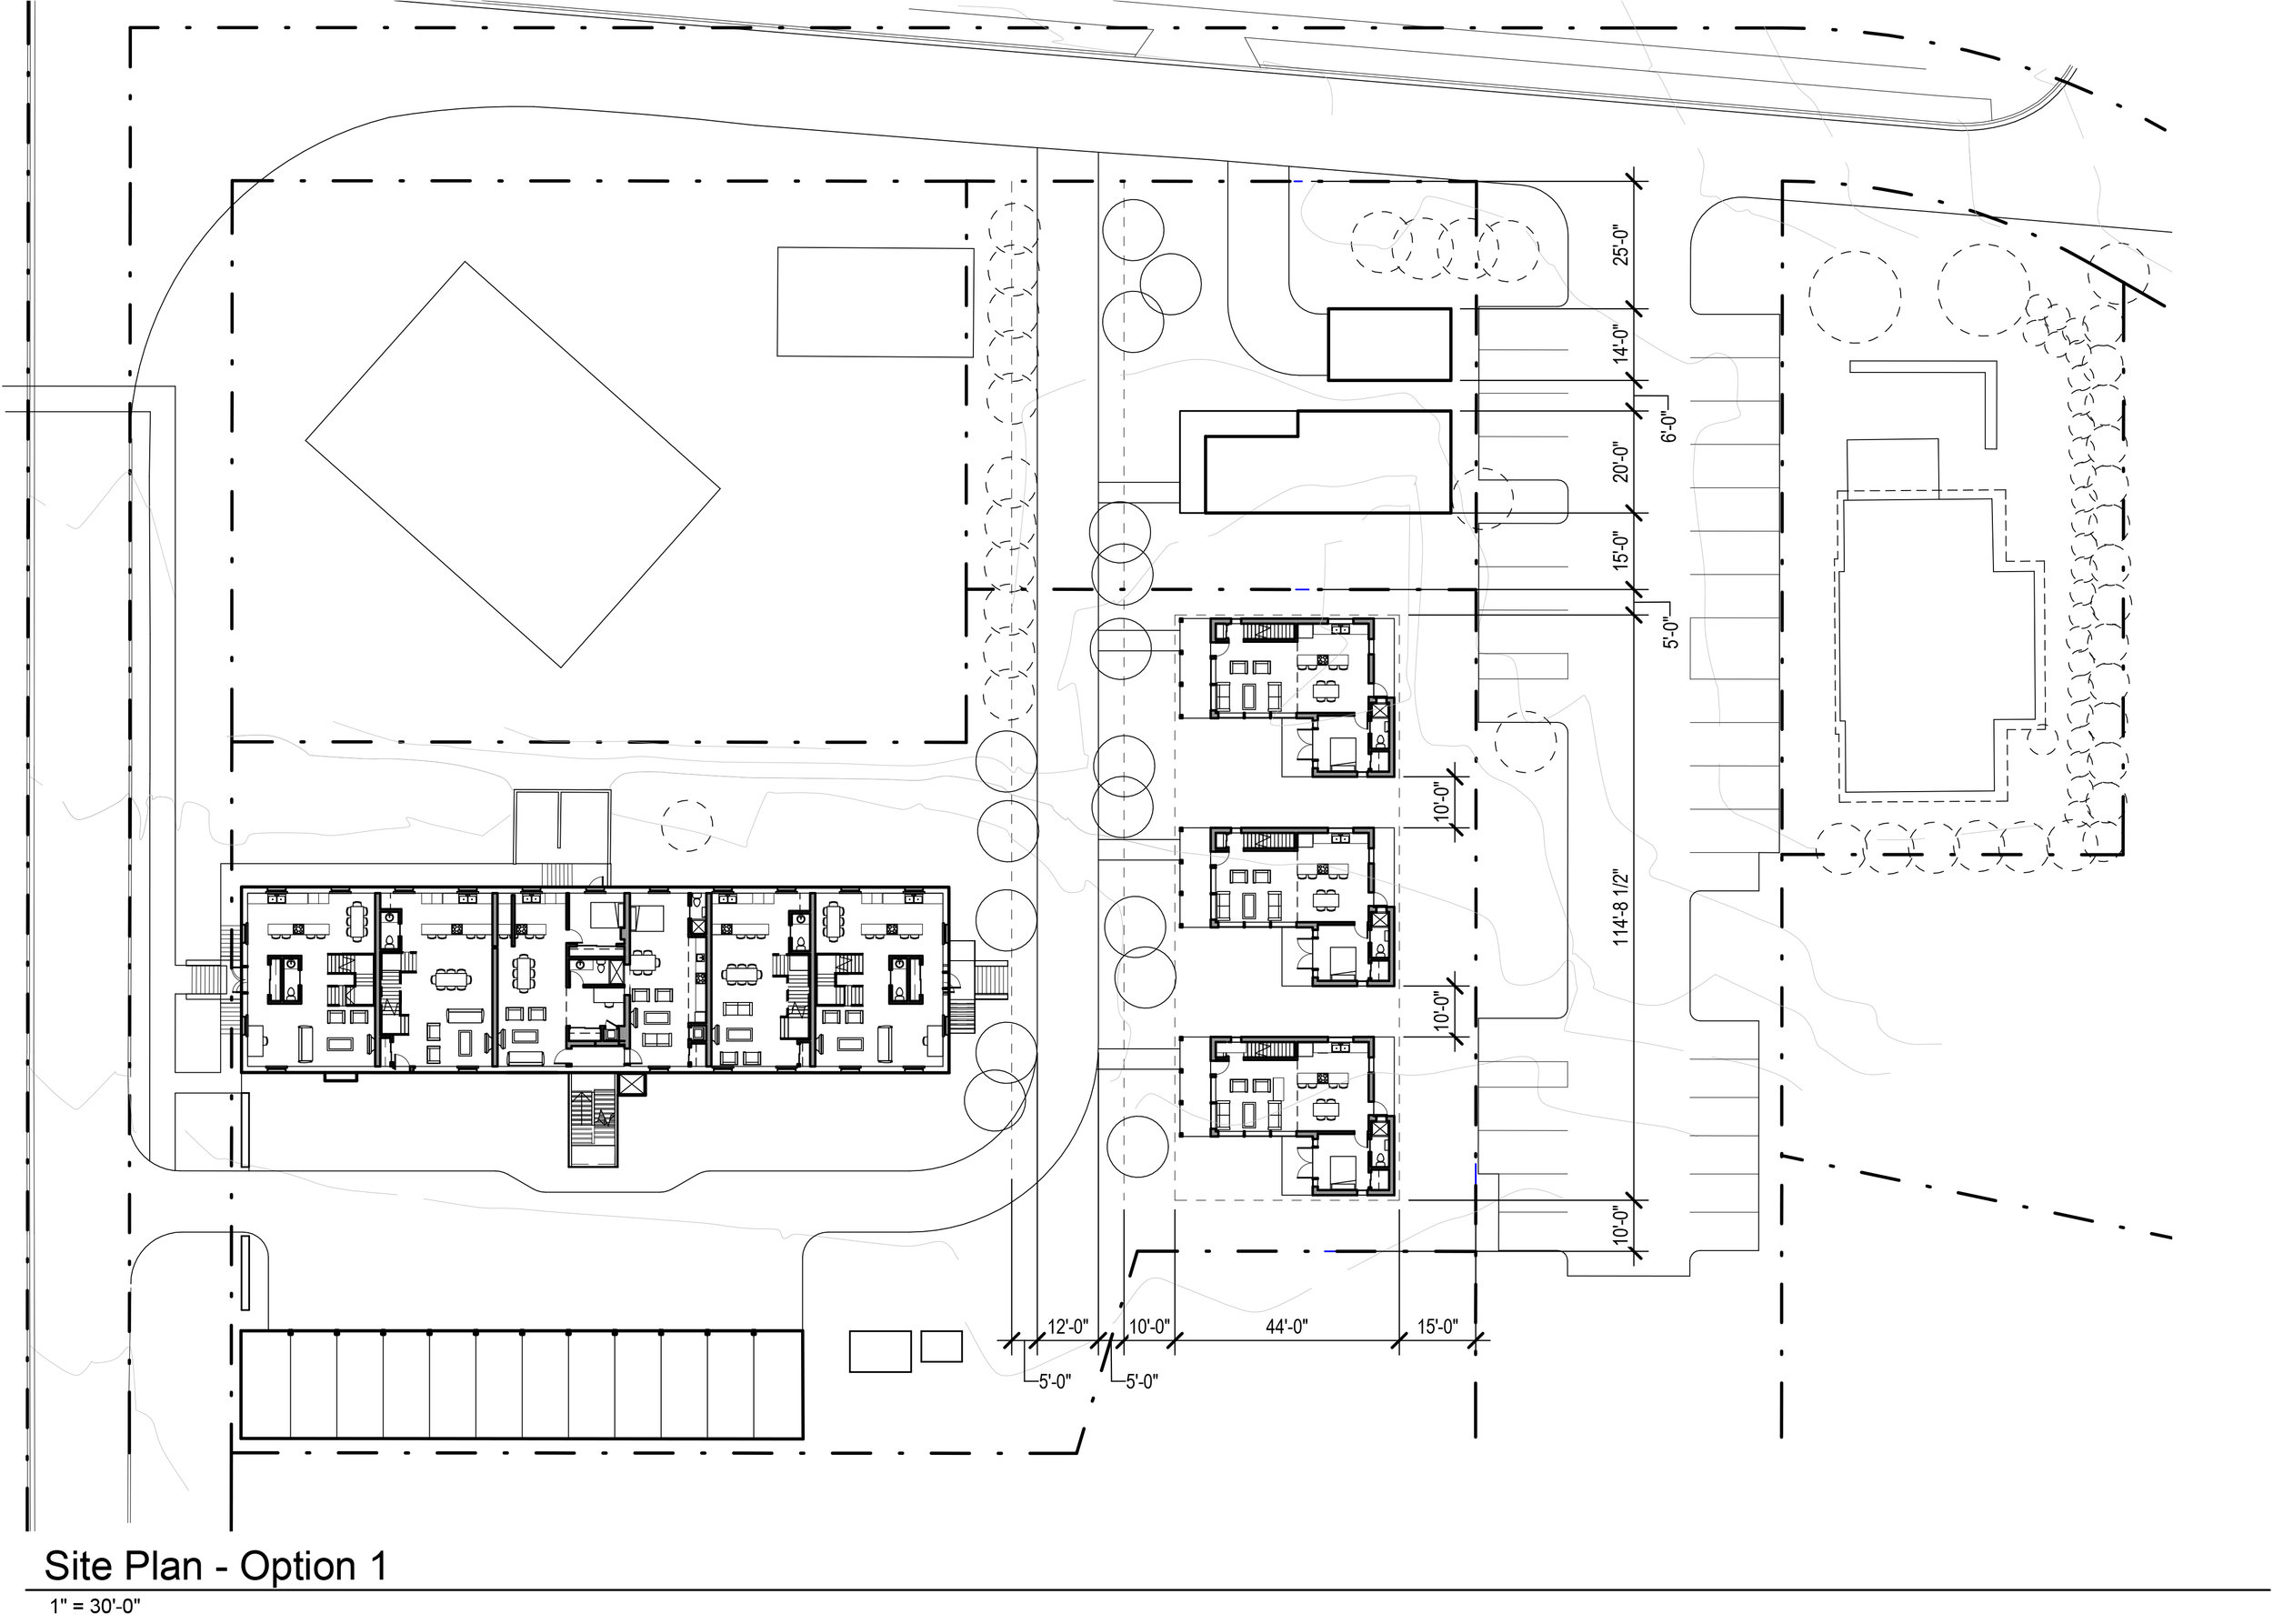 20180216 Site Plan - 3 Townhomes (1).jpg